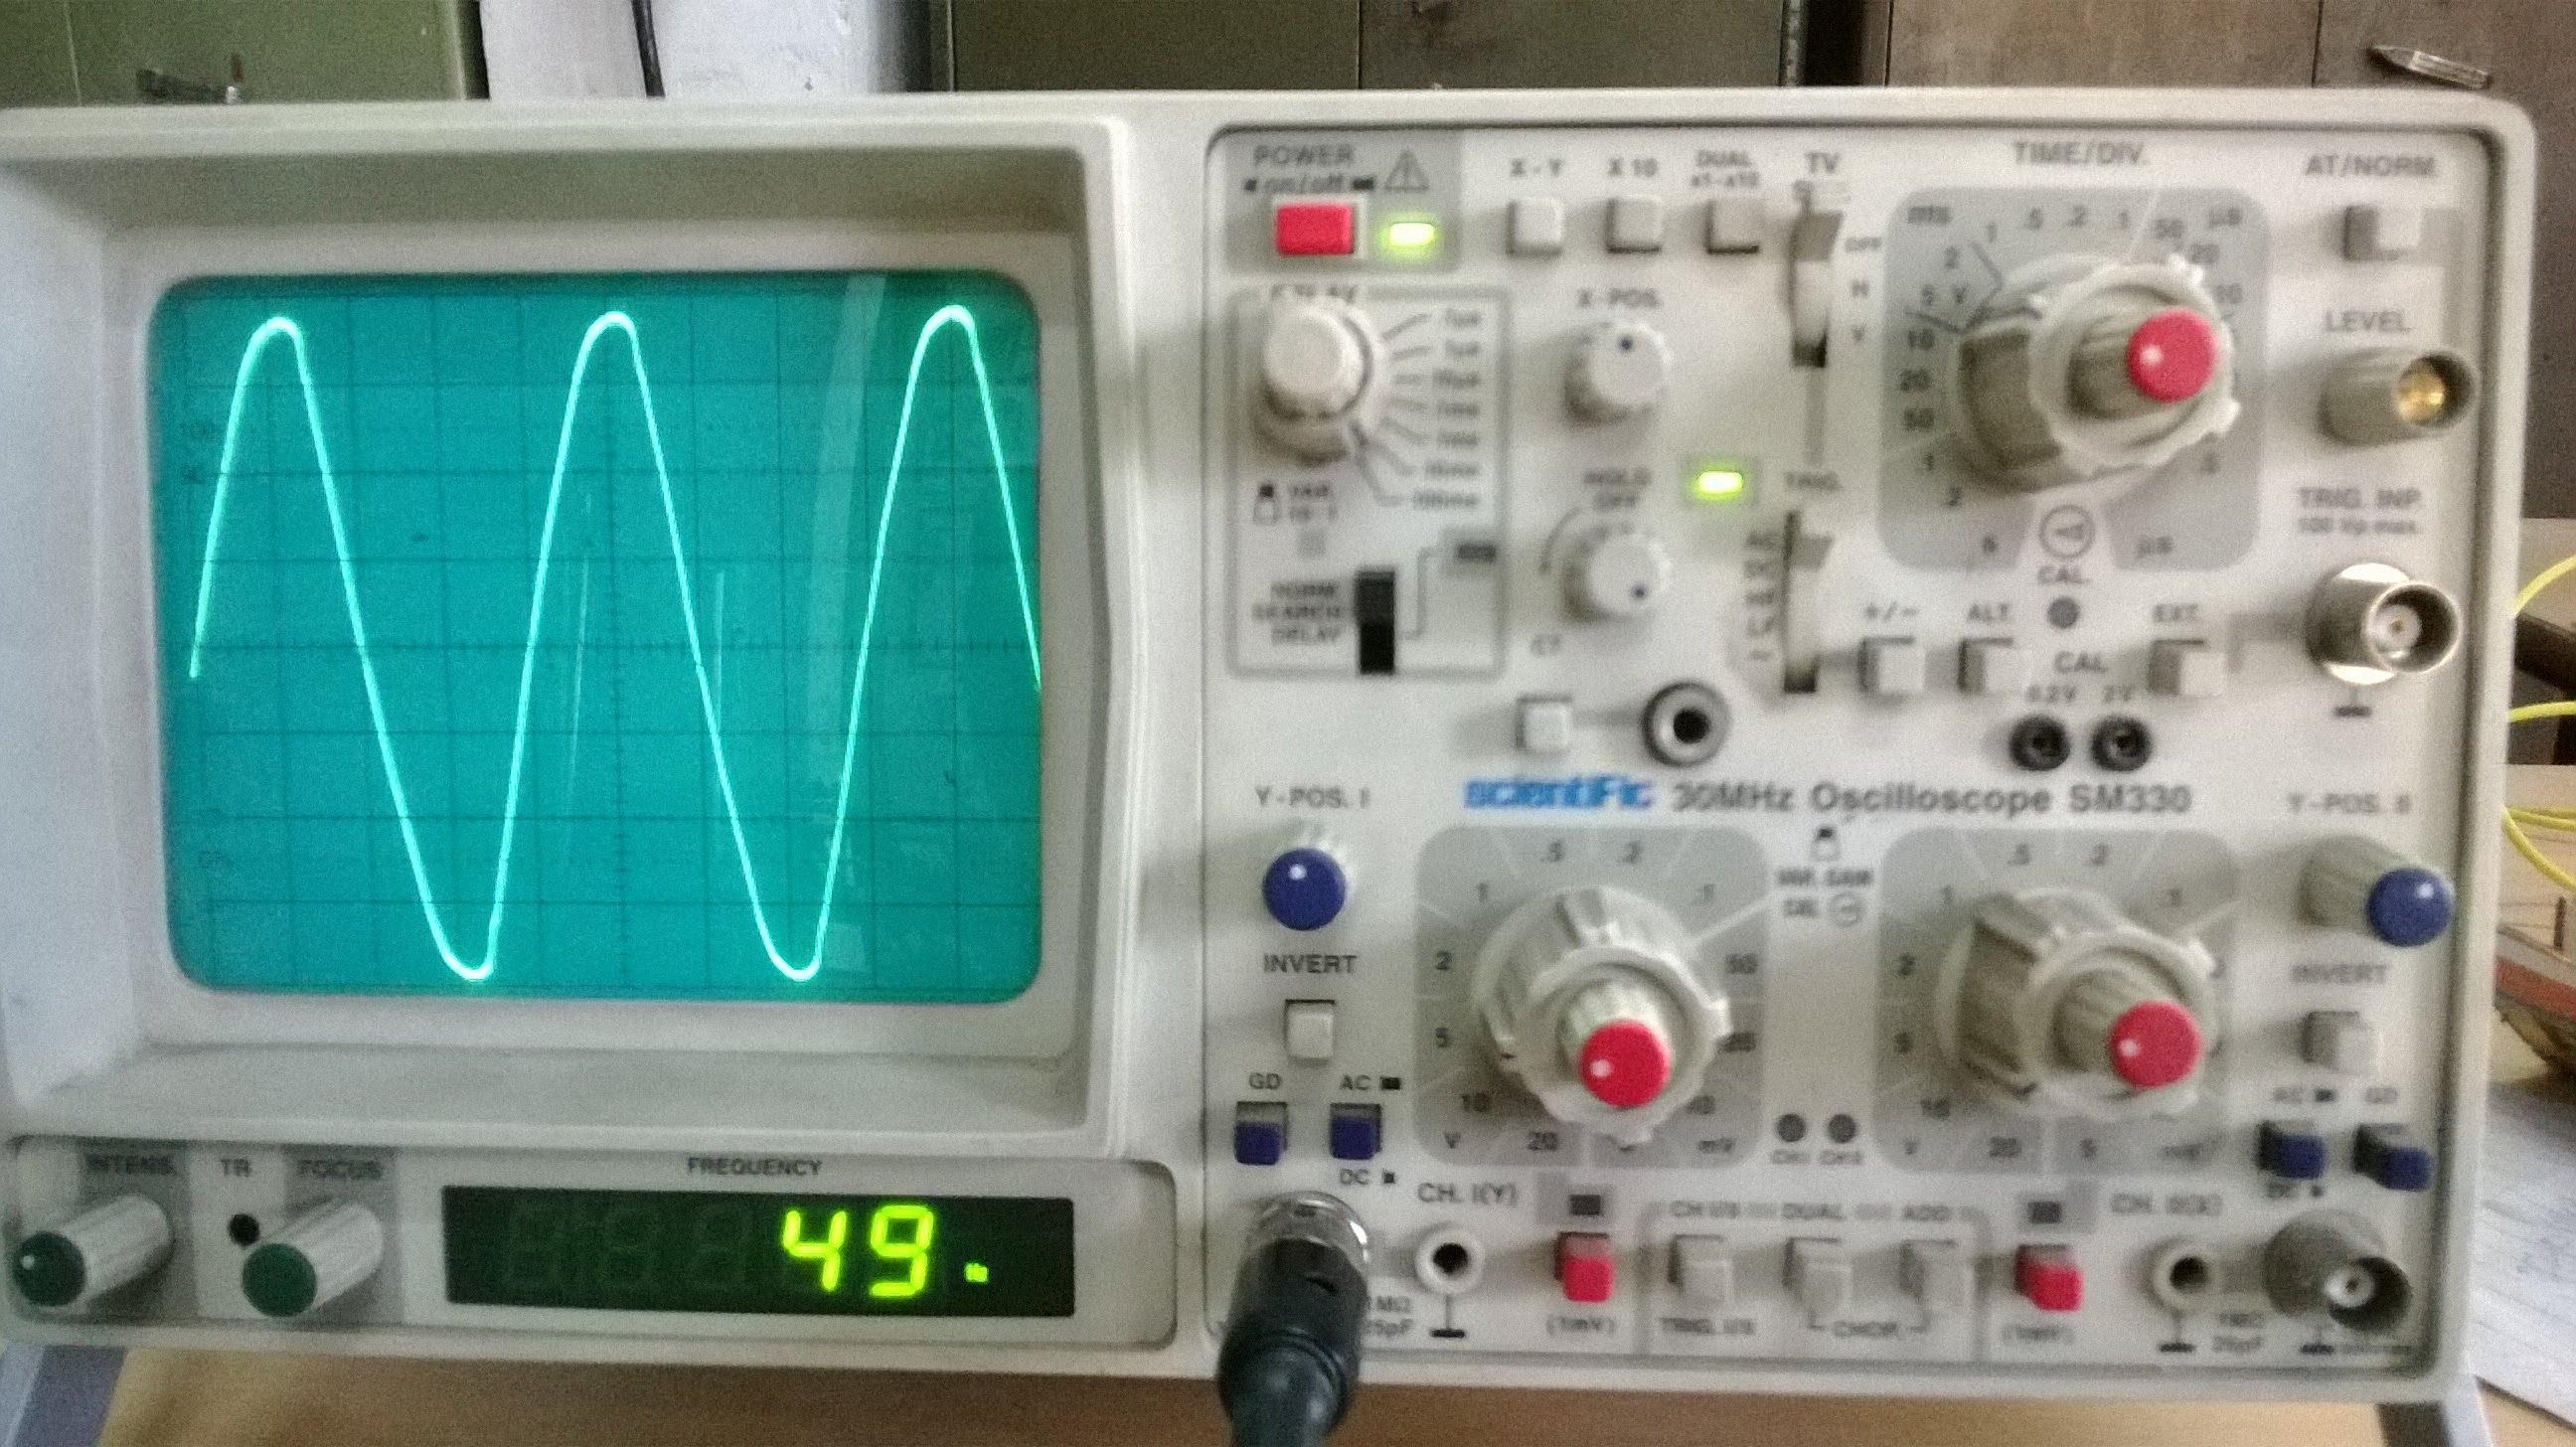 Images of Oscilloscope | 2592x1456